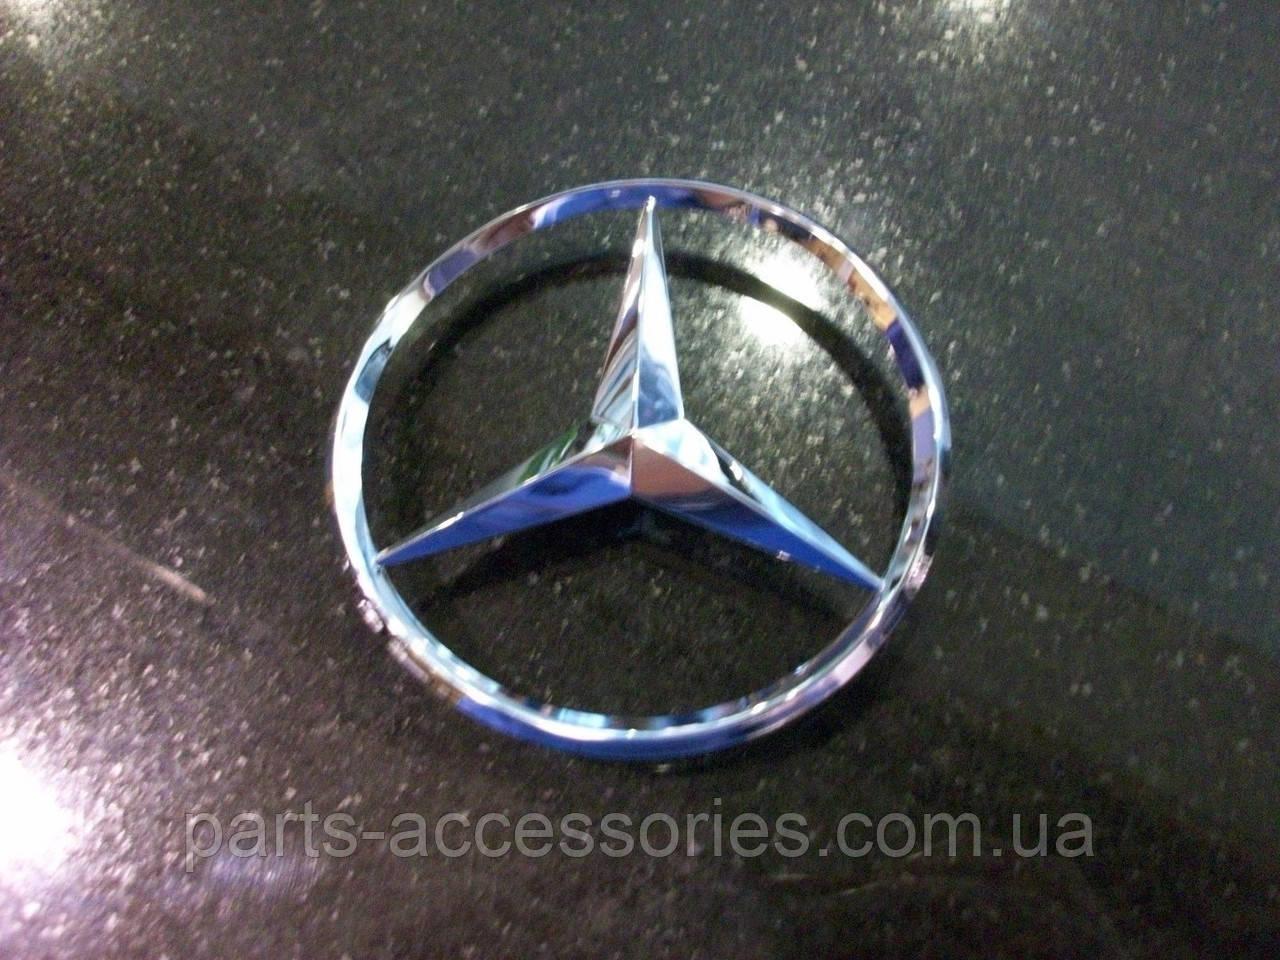 Mercedes SL Class R230 2003-2012 значок емблема на кришку багажника нова оригінал